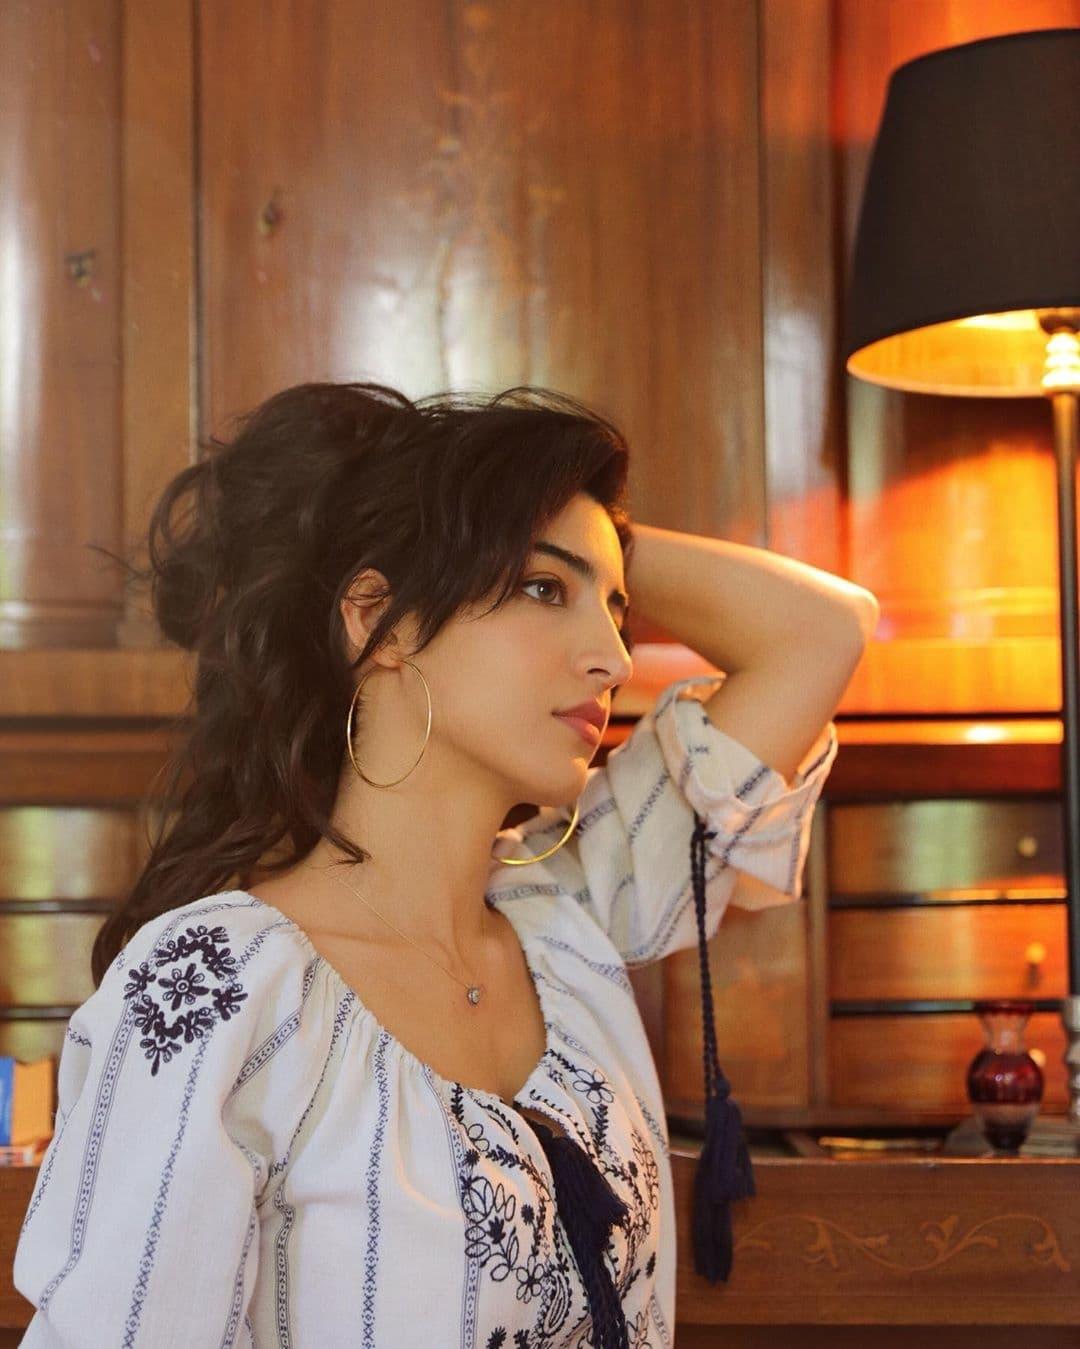 Cantiknya Luciana Zogbi, Songwriter Brasil dengan Suara Merdu